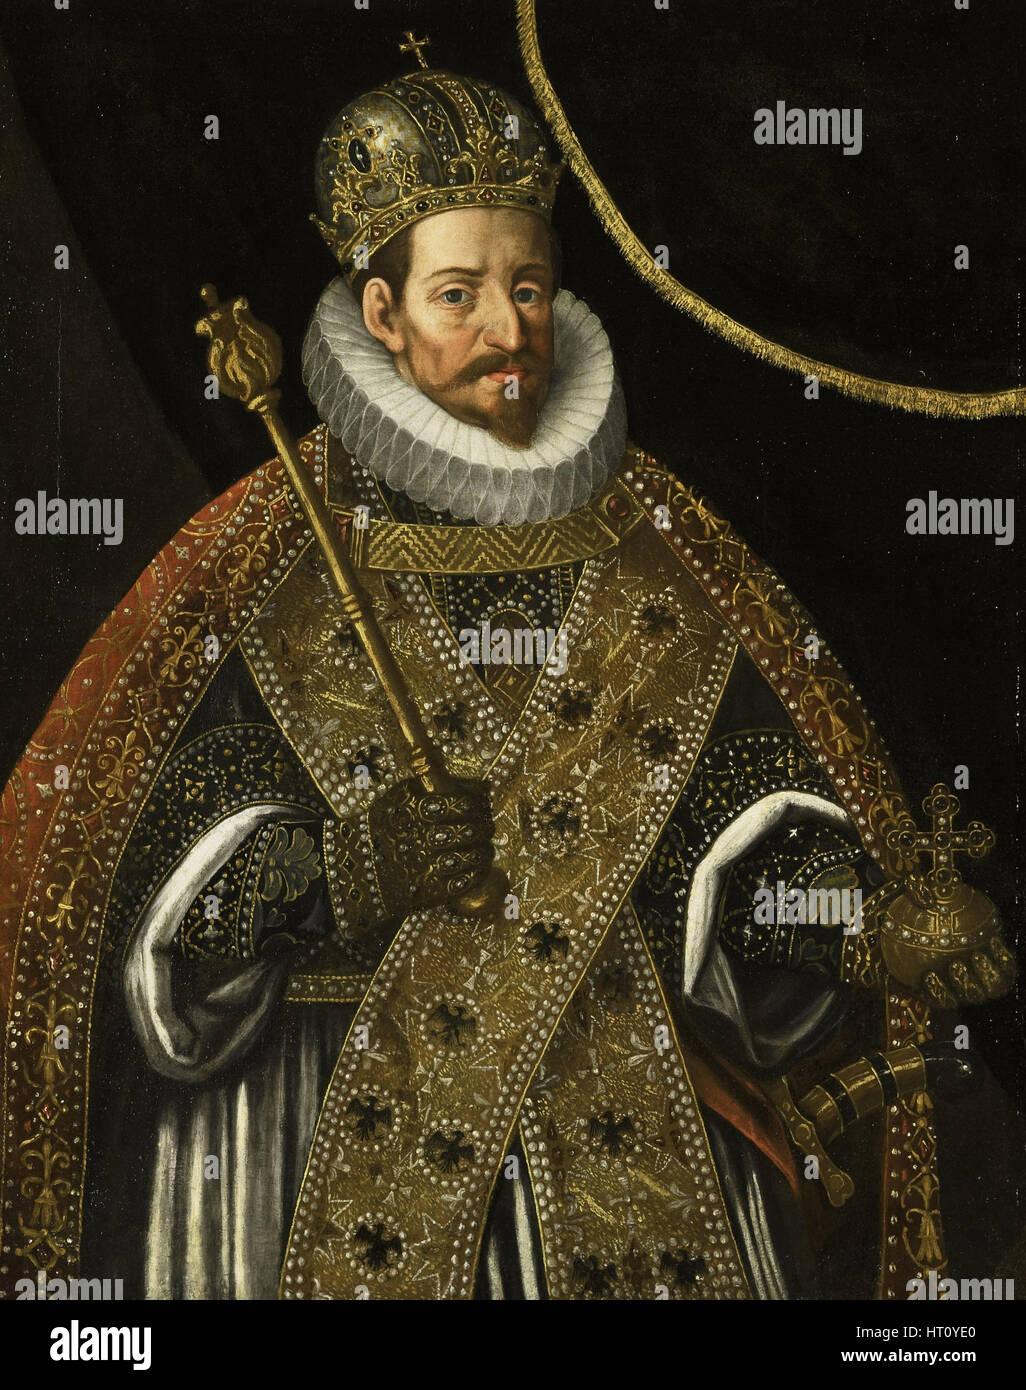 Portrait of Matthias (1557-1619), Holy Roman Emperor, c. 1610. Artist: Aachen, Hans von (1552-1615) - Stock Image